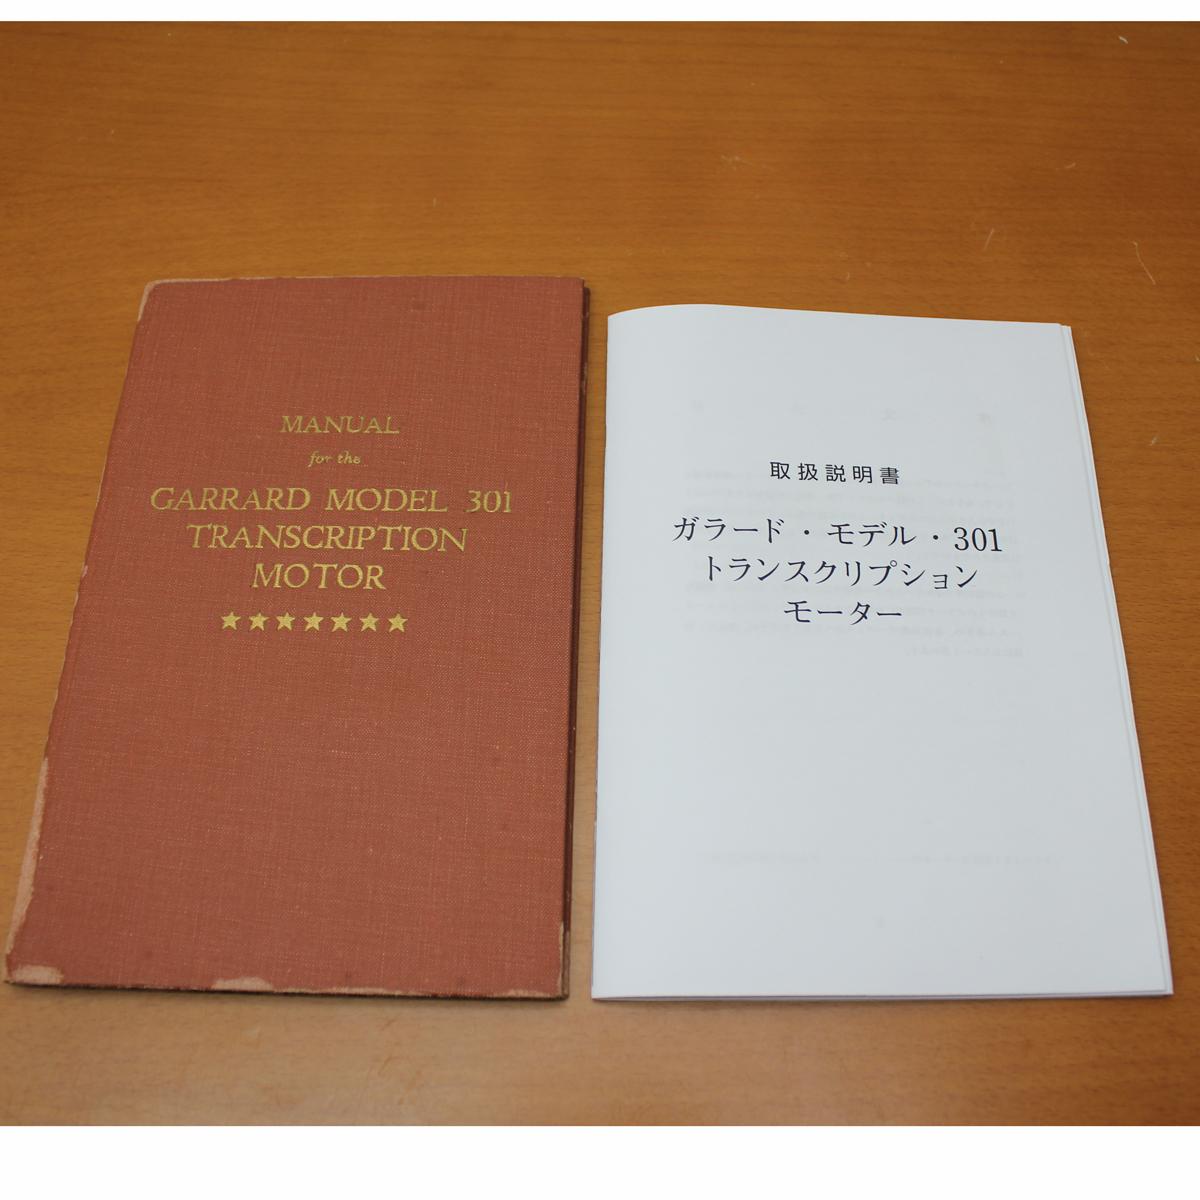 GARRARD301 manual[SN:768○○番台(星7)]ガラード英文取扱説明書 マニュアル おまけ日本語解説コピー付き_画像1